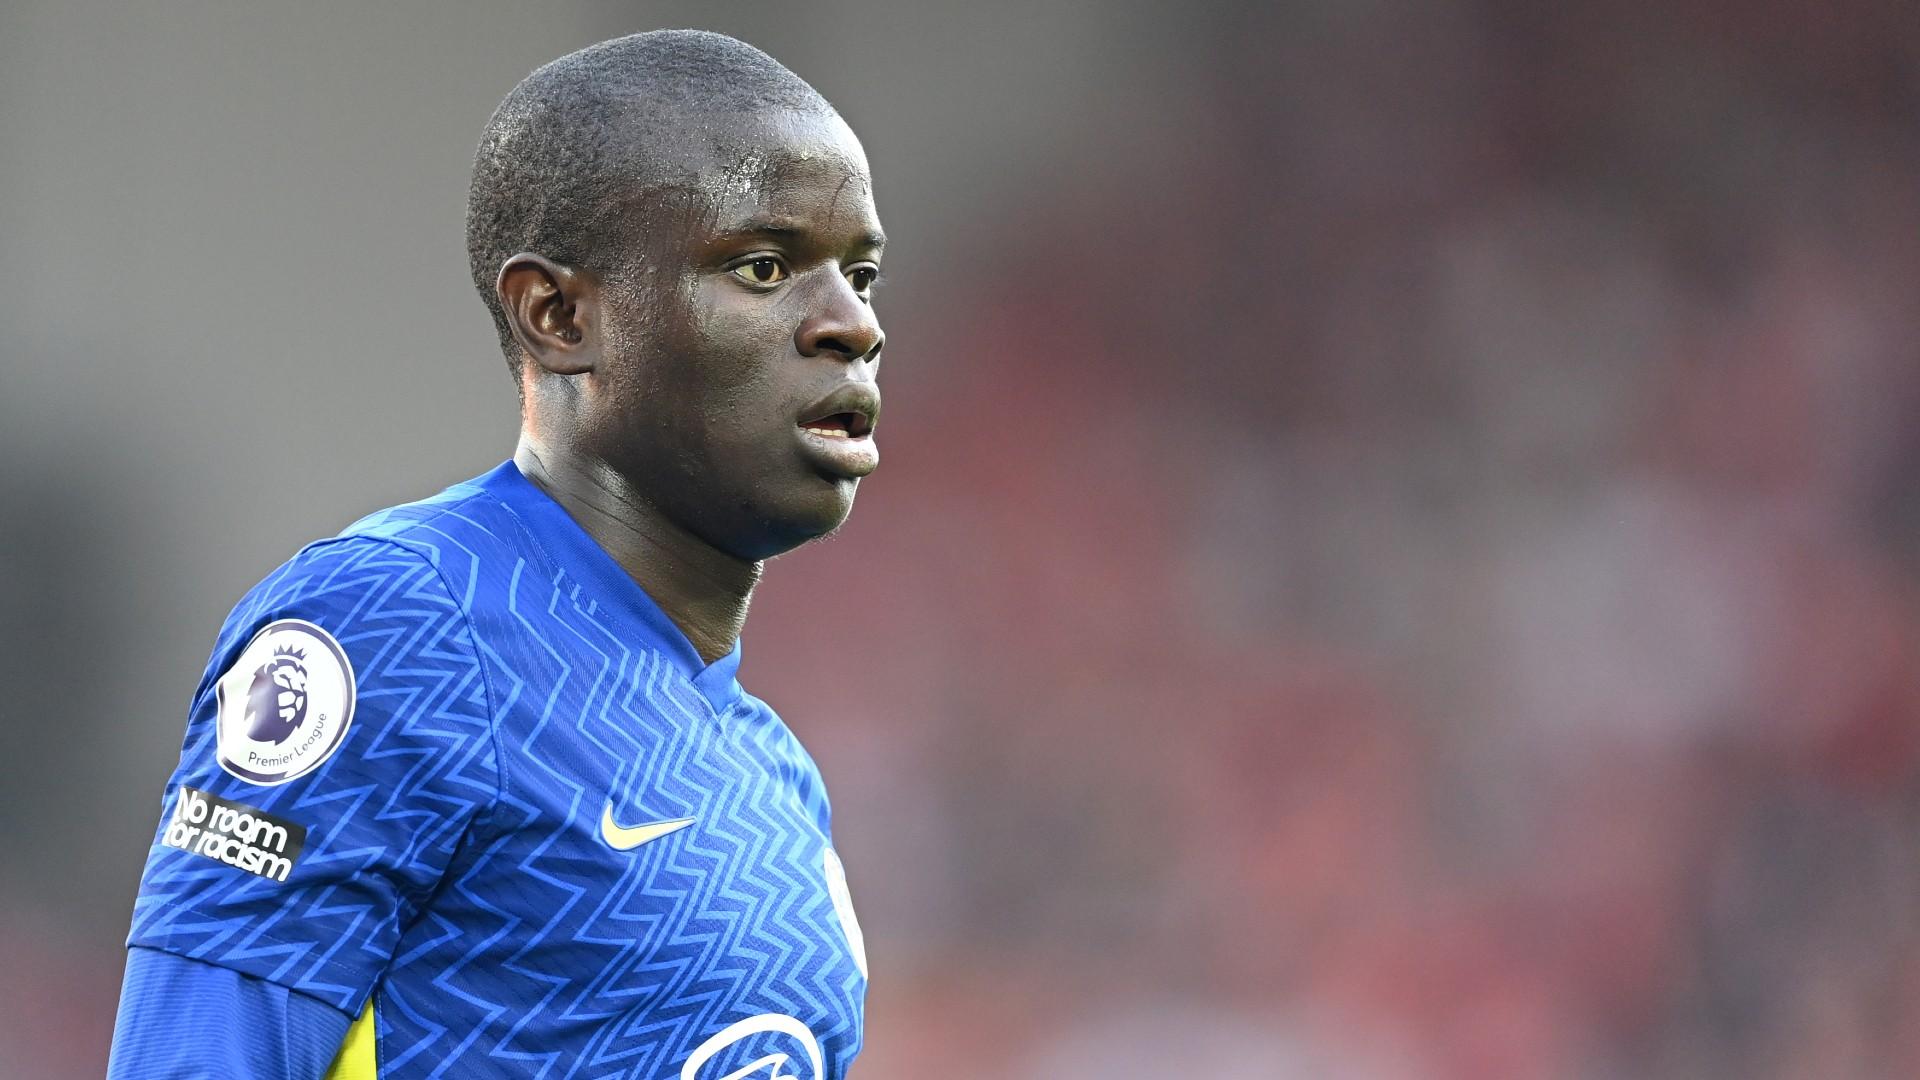 Kante blow for Chelsea as coronavirus rules midfielder out of key Champions League & Premier League fixtures